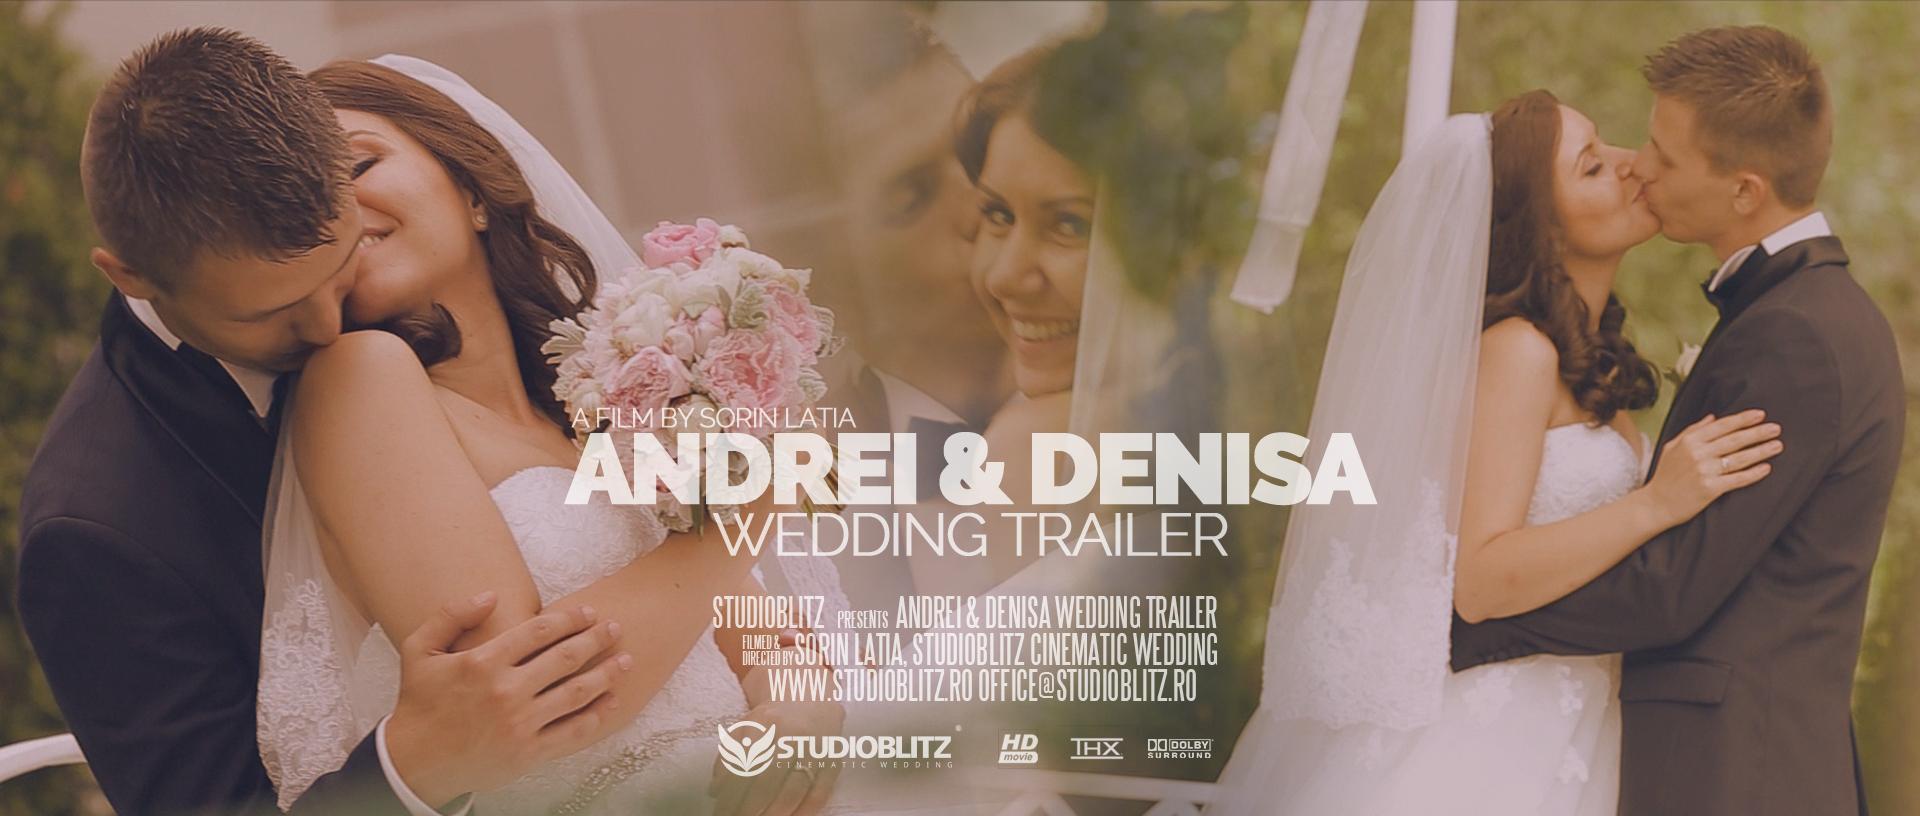 Coperta Filmare Nunta Andrei Denisa Wedding Trailer Filmari Nunti